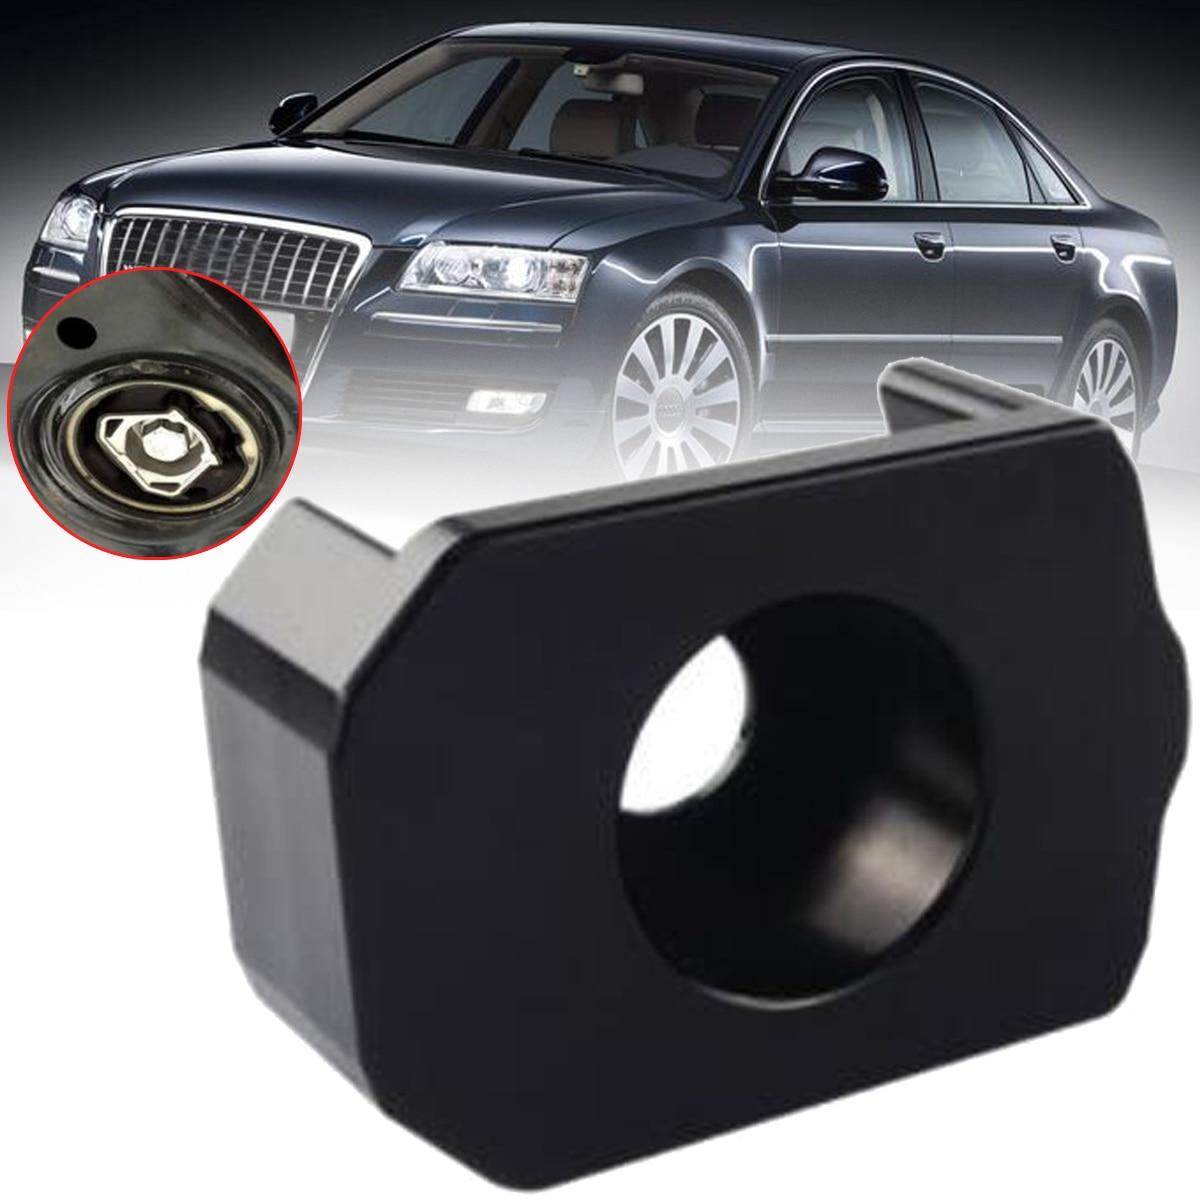 Carro de Alumínio Billet MQB Osso de Cão Mk7 Dogbone Montar Inserção Se Encaixa Para VW Volkswagen Golf/GTI/R 8 v Para Audi A3/S3/RS3 TT/TTS/TTRS